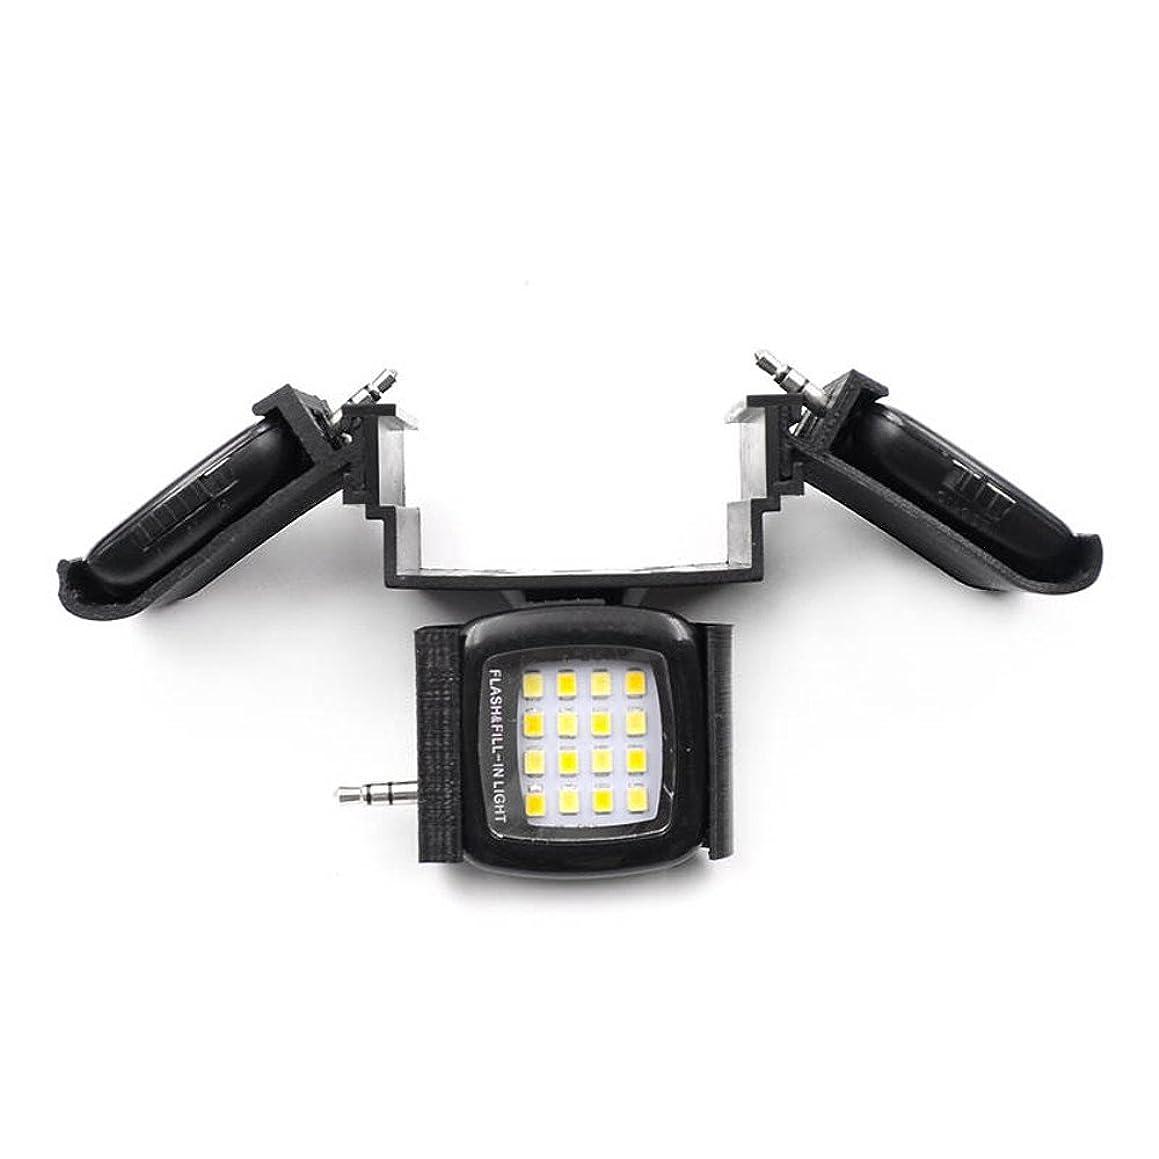 Littleice Night Flying LED Light Mount Buckle Holder For DJI Mavic AIR Drone Part